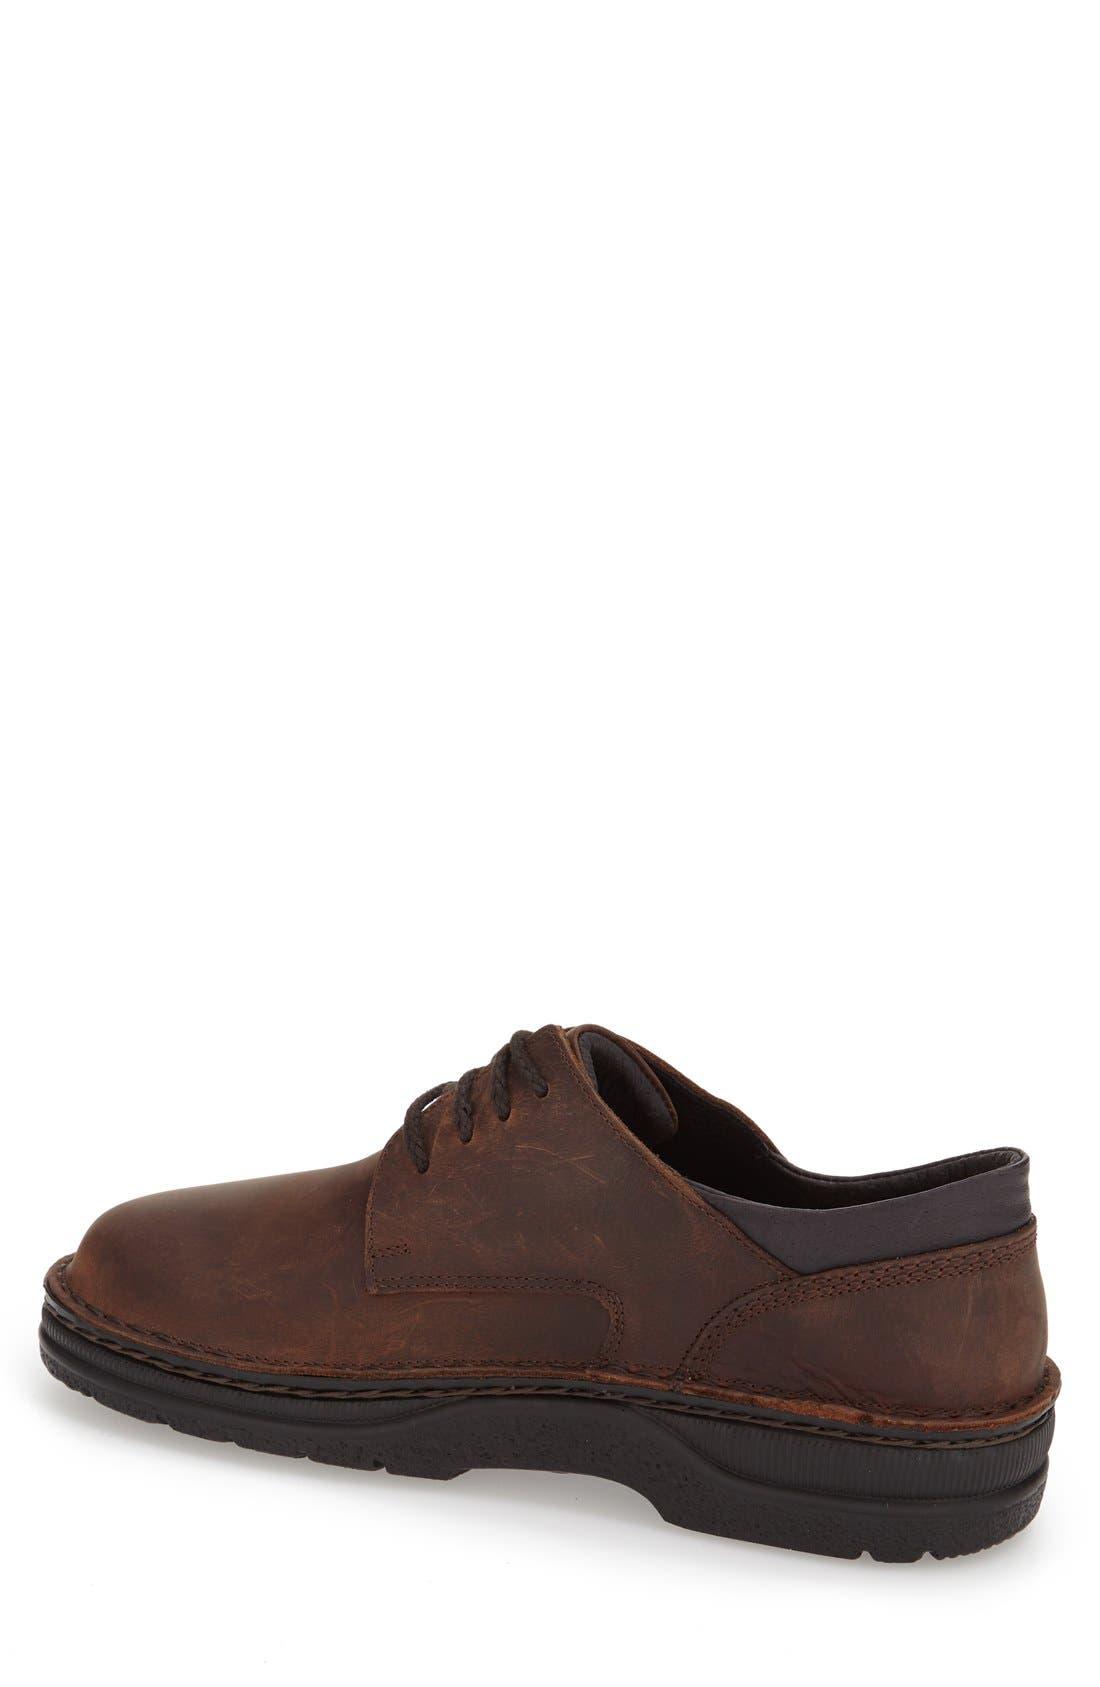 Denali Plain Toe Derby,                             Alternate thumbnail 2, color,                             Brown Leather